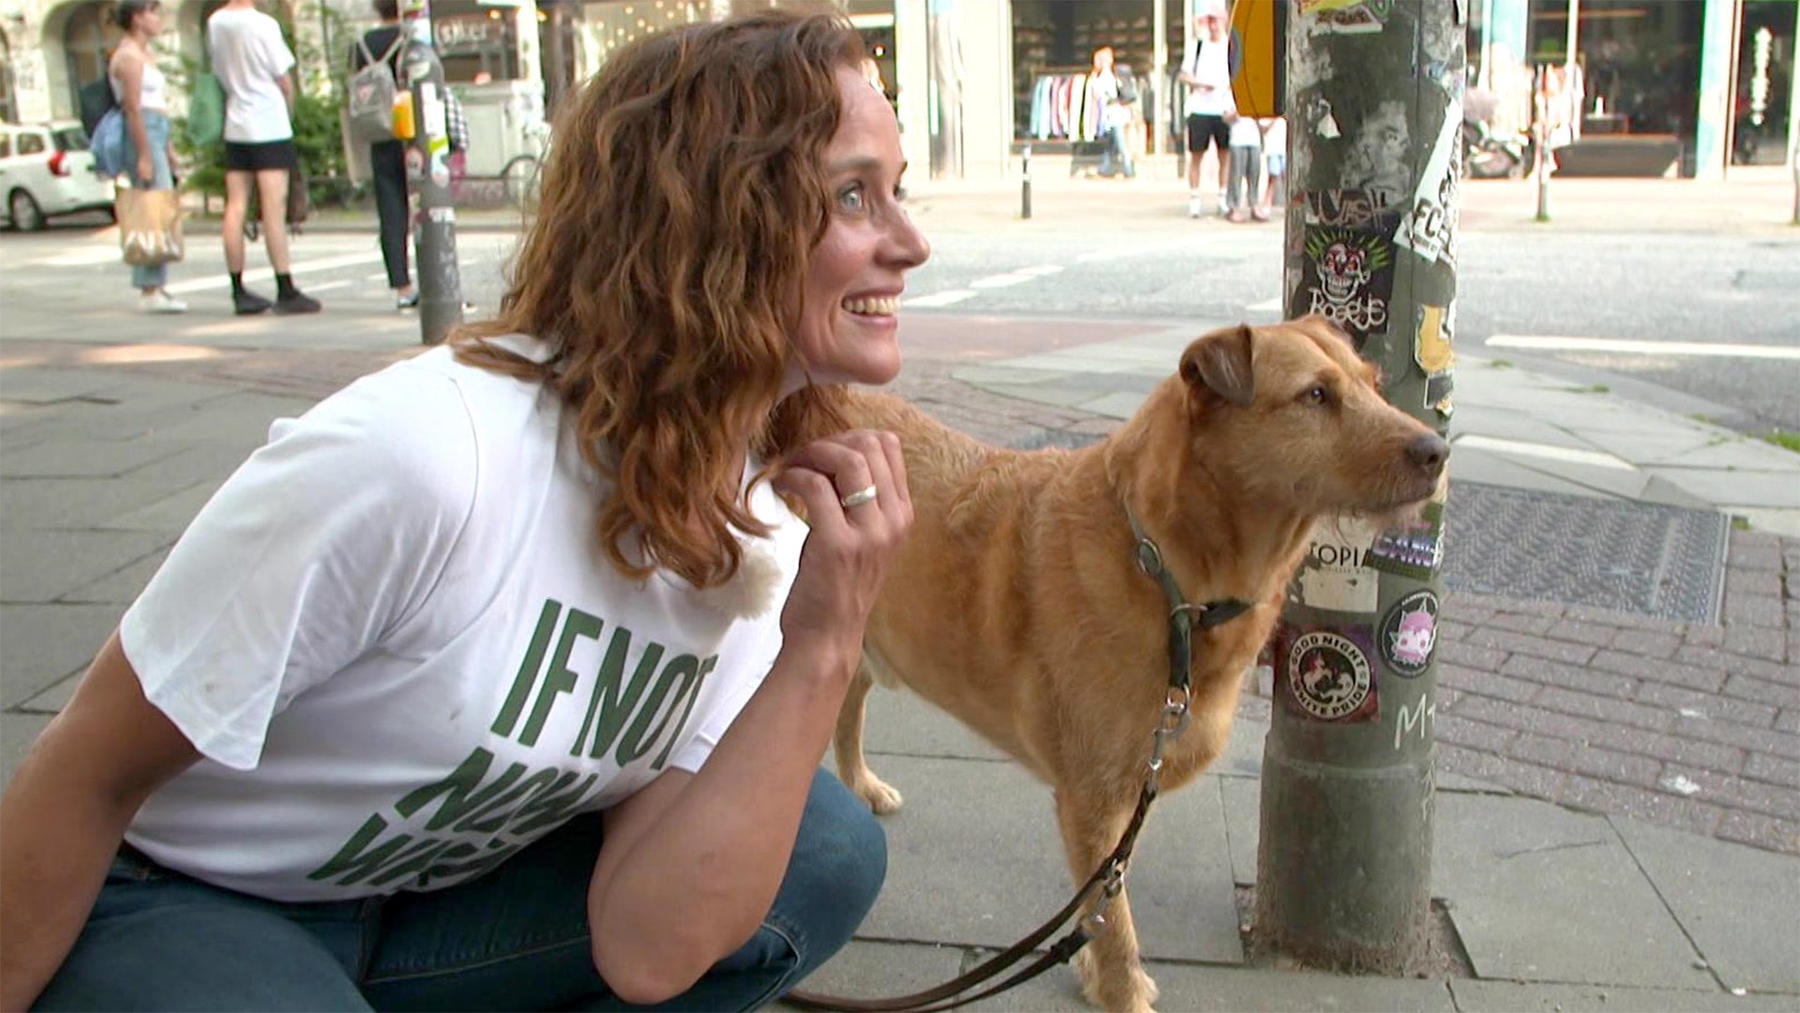 Heute u.a.: Hunde in der Großstadt